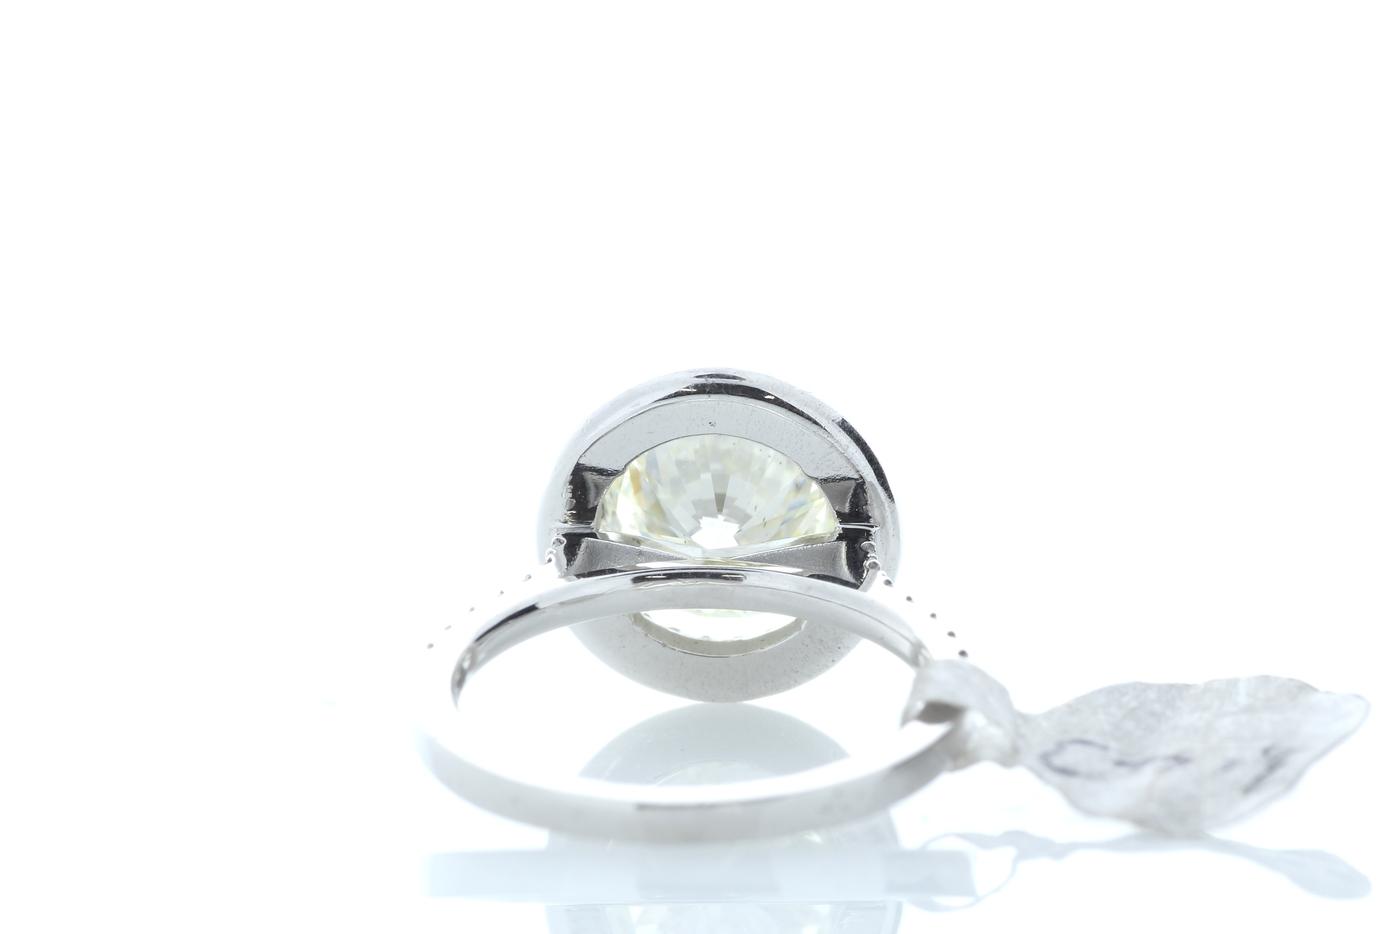 18ct White Gold Halo Set Diamond Ring 3.43 Carats - Image 3 of 5